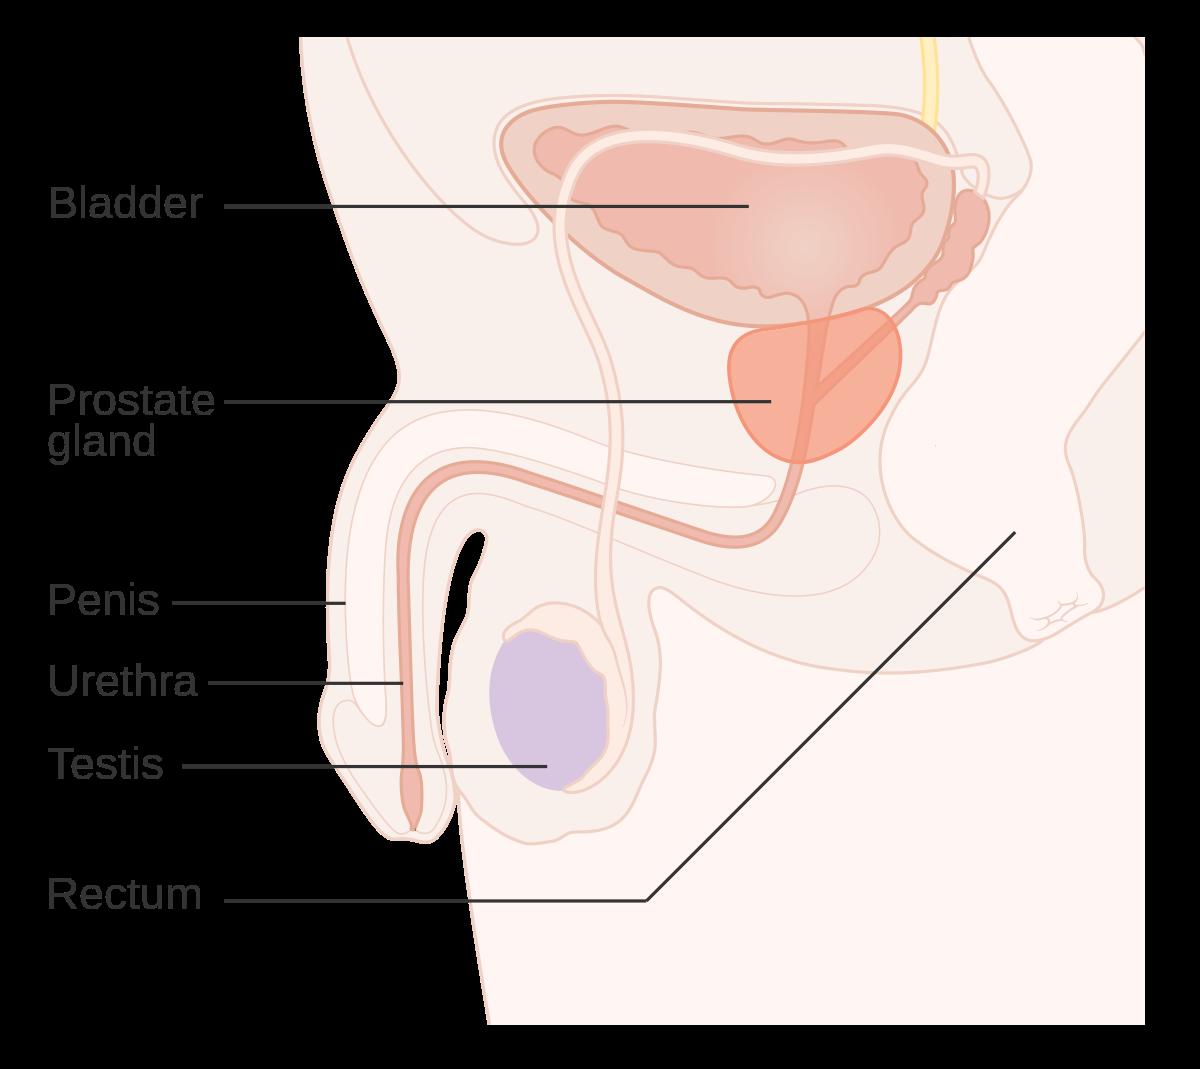 papilloma virus positivo e pap test positivo virus papiloma humano biopsia